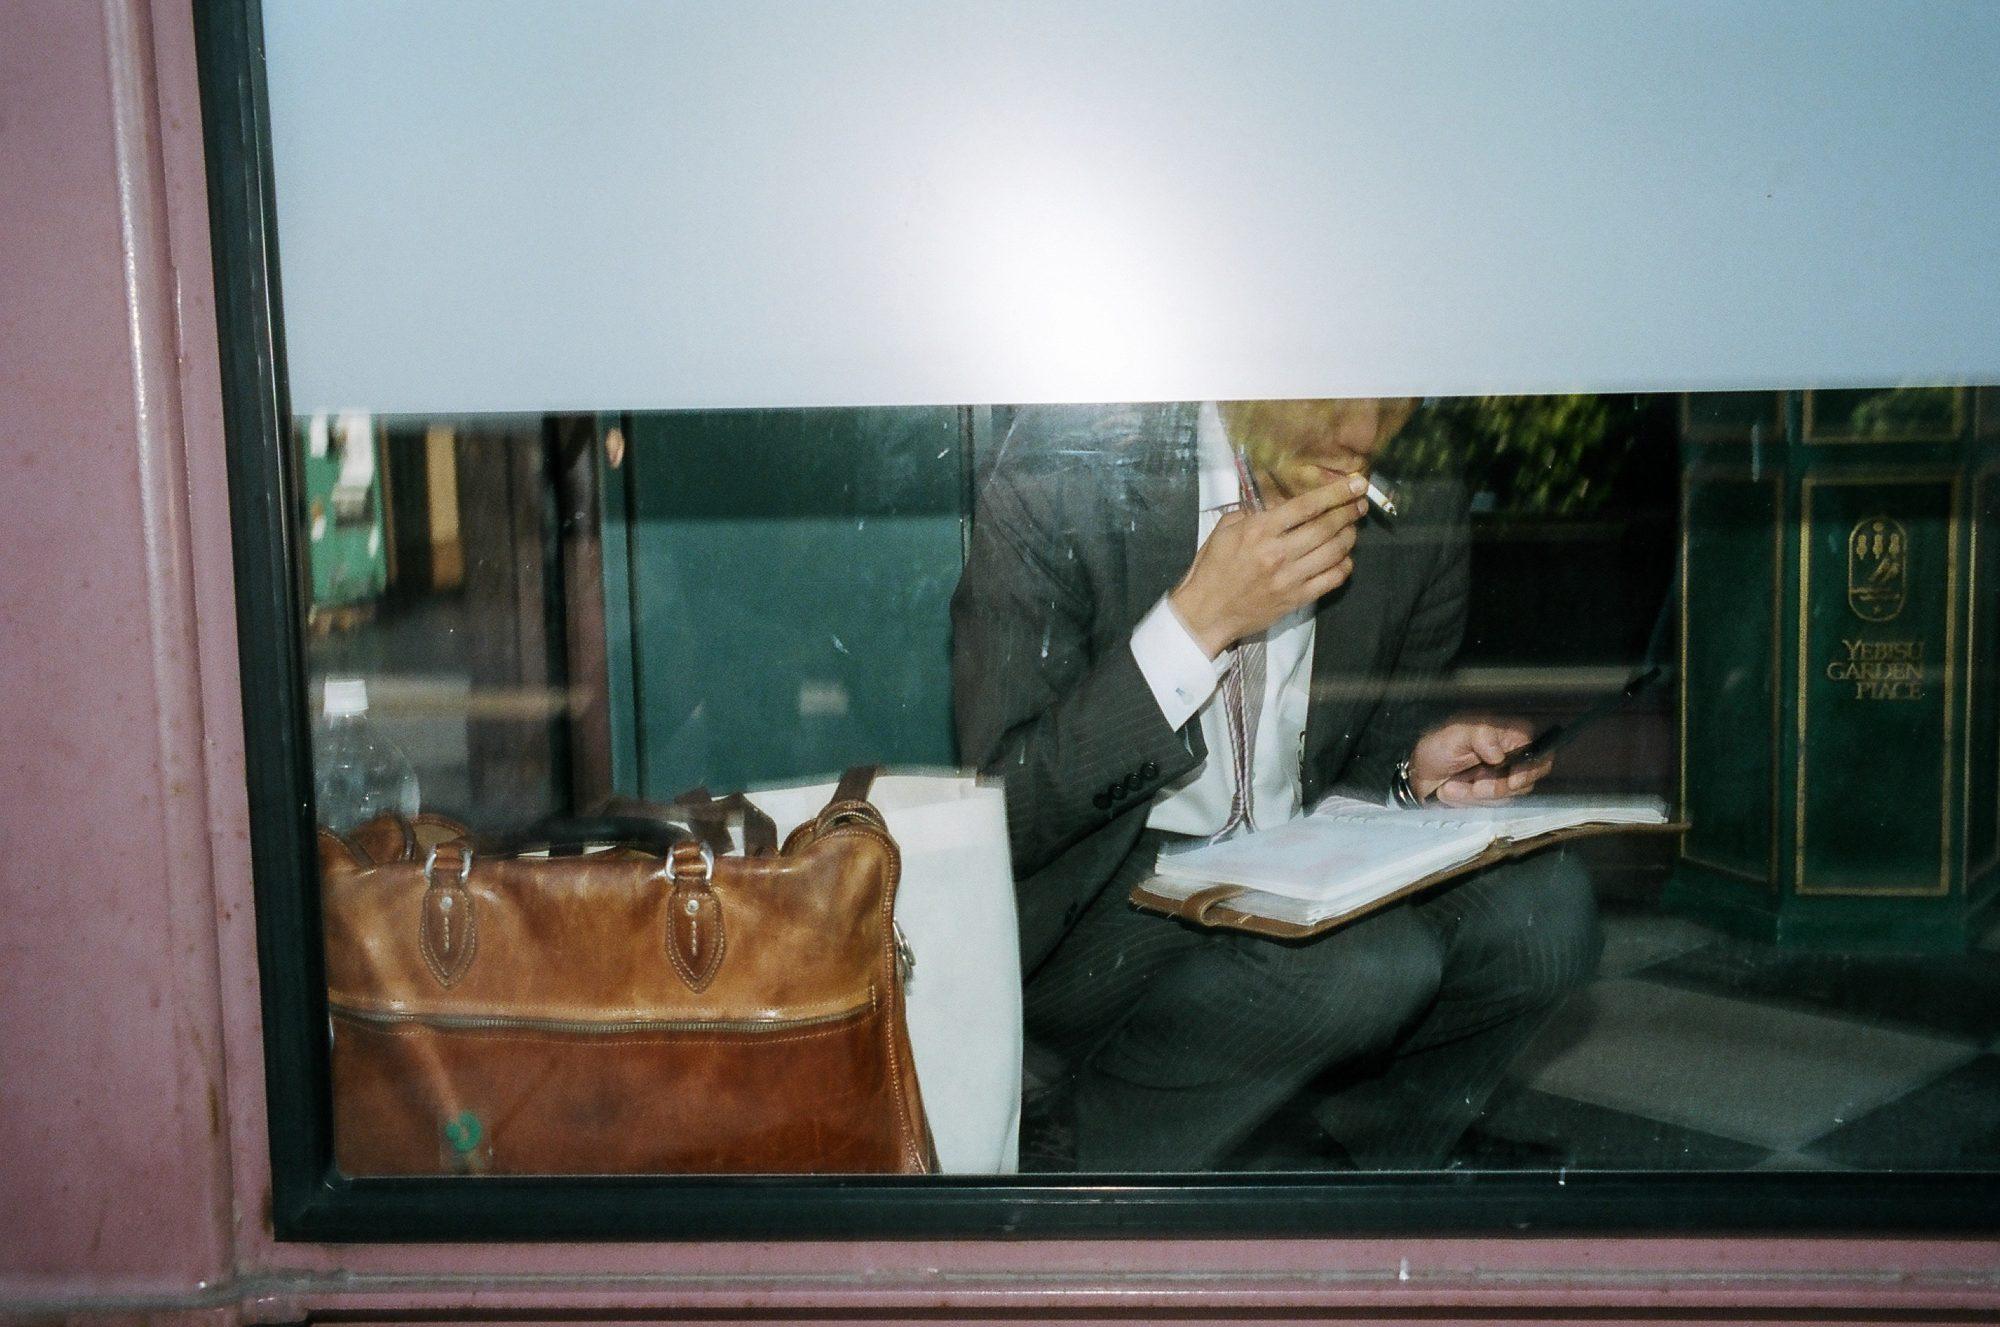 eric-kim-street-photography-suits-project-kodak-portra-400-film-15